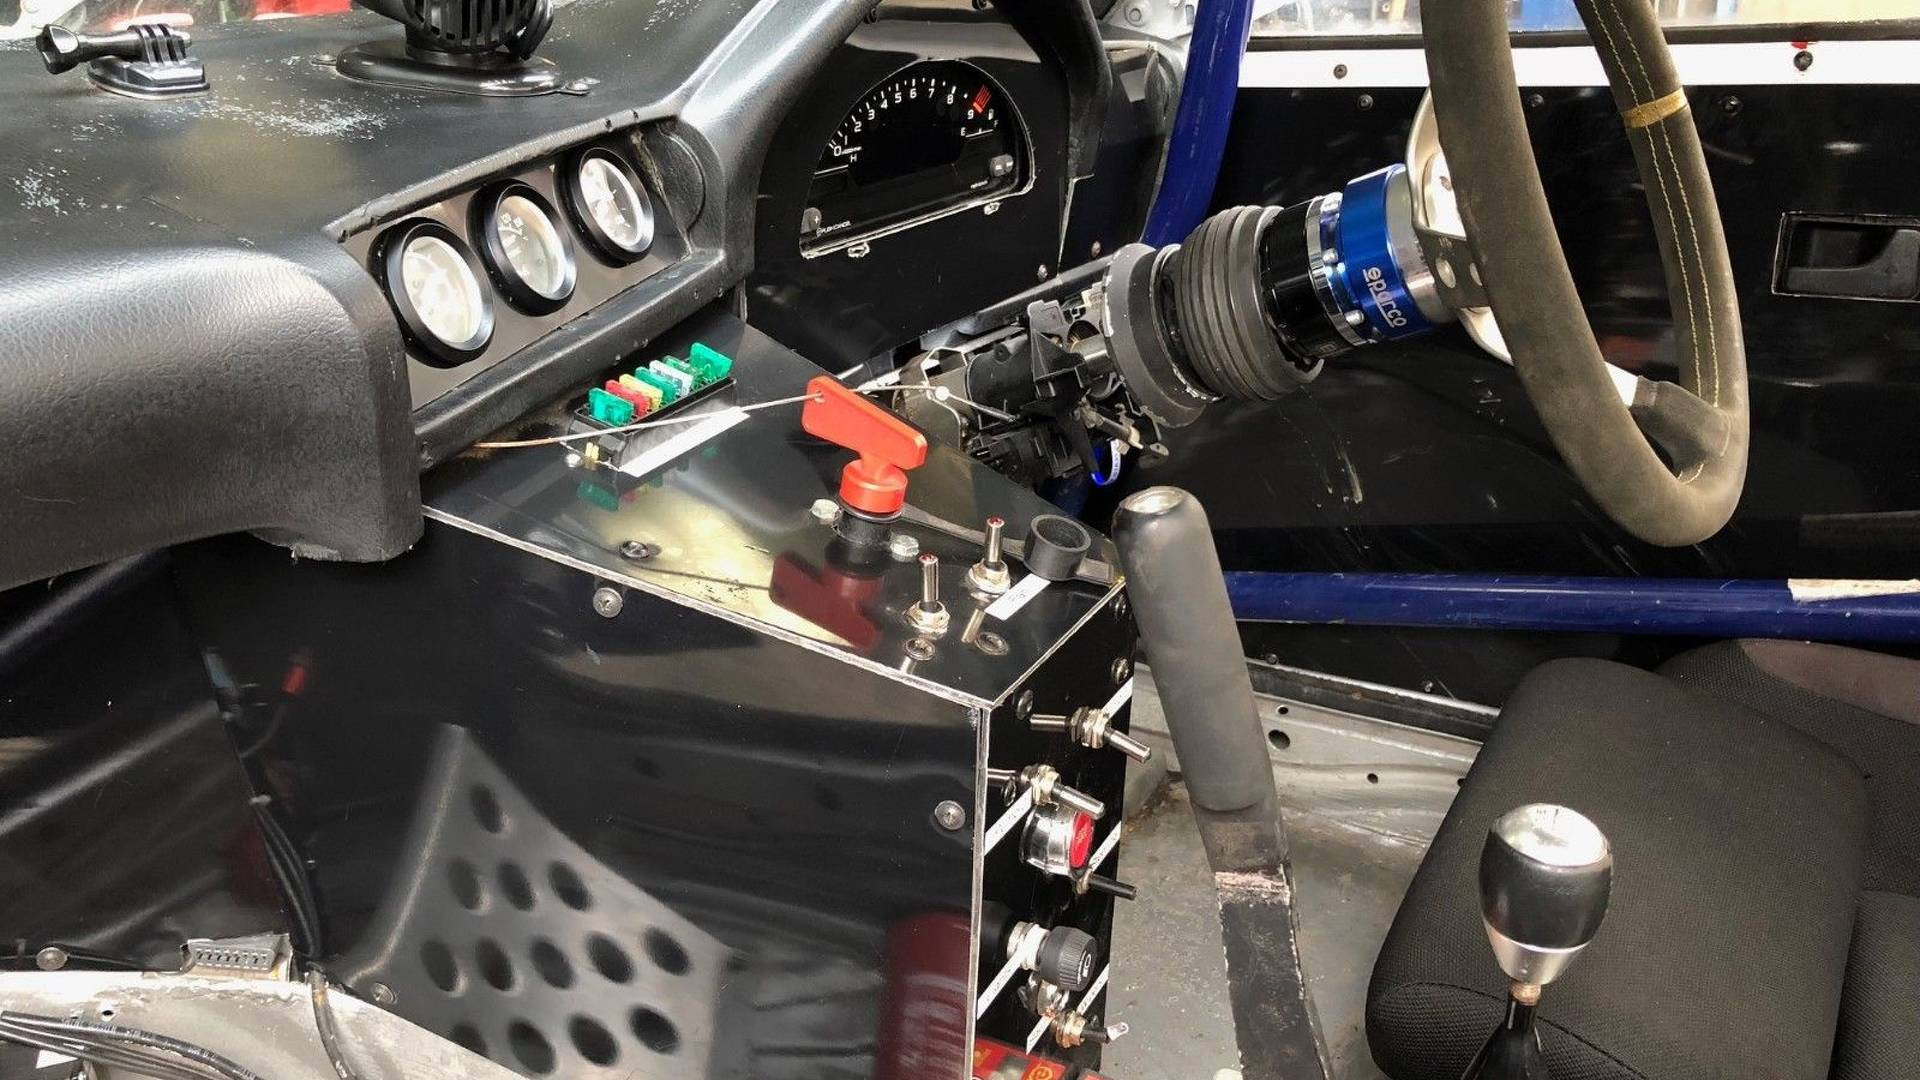 BMW_3_Series_Honda_S2000_engine_0005